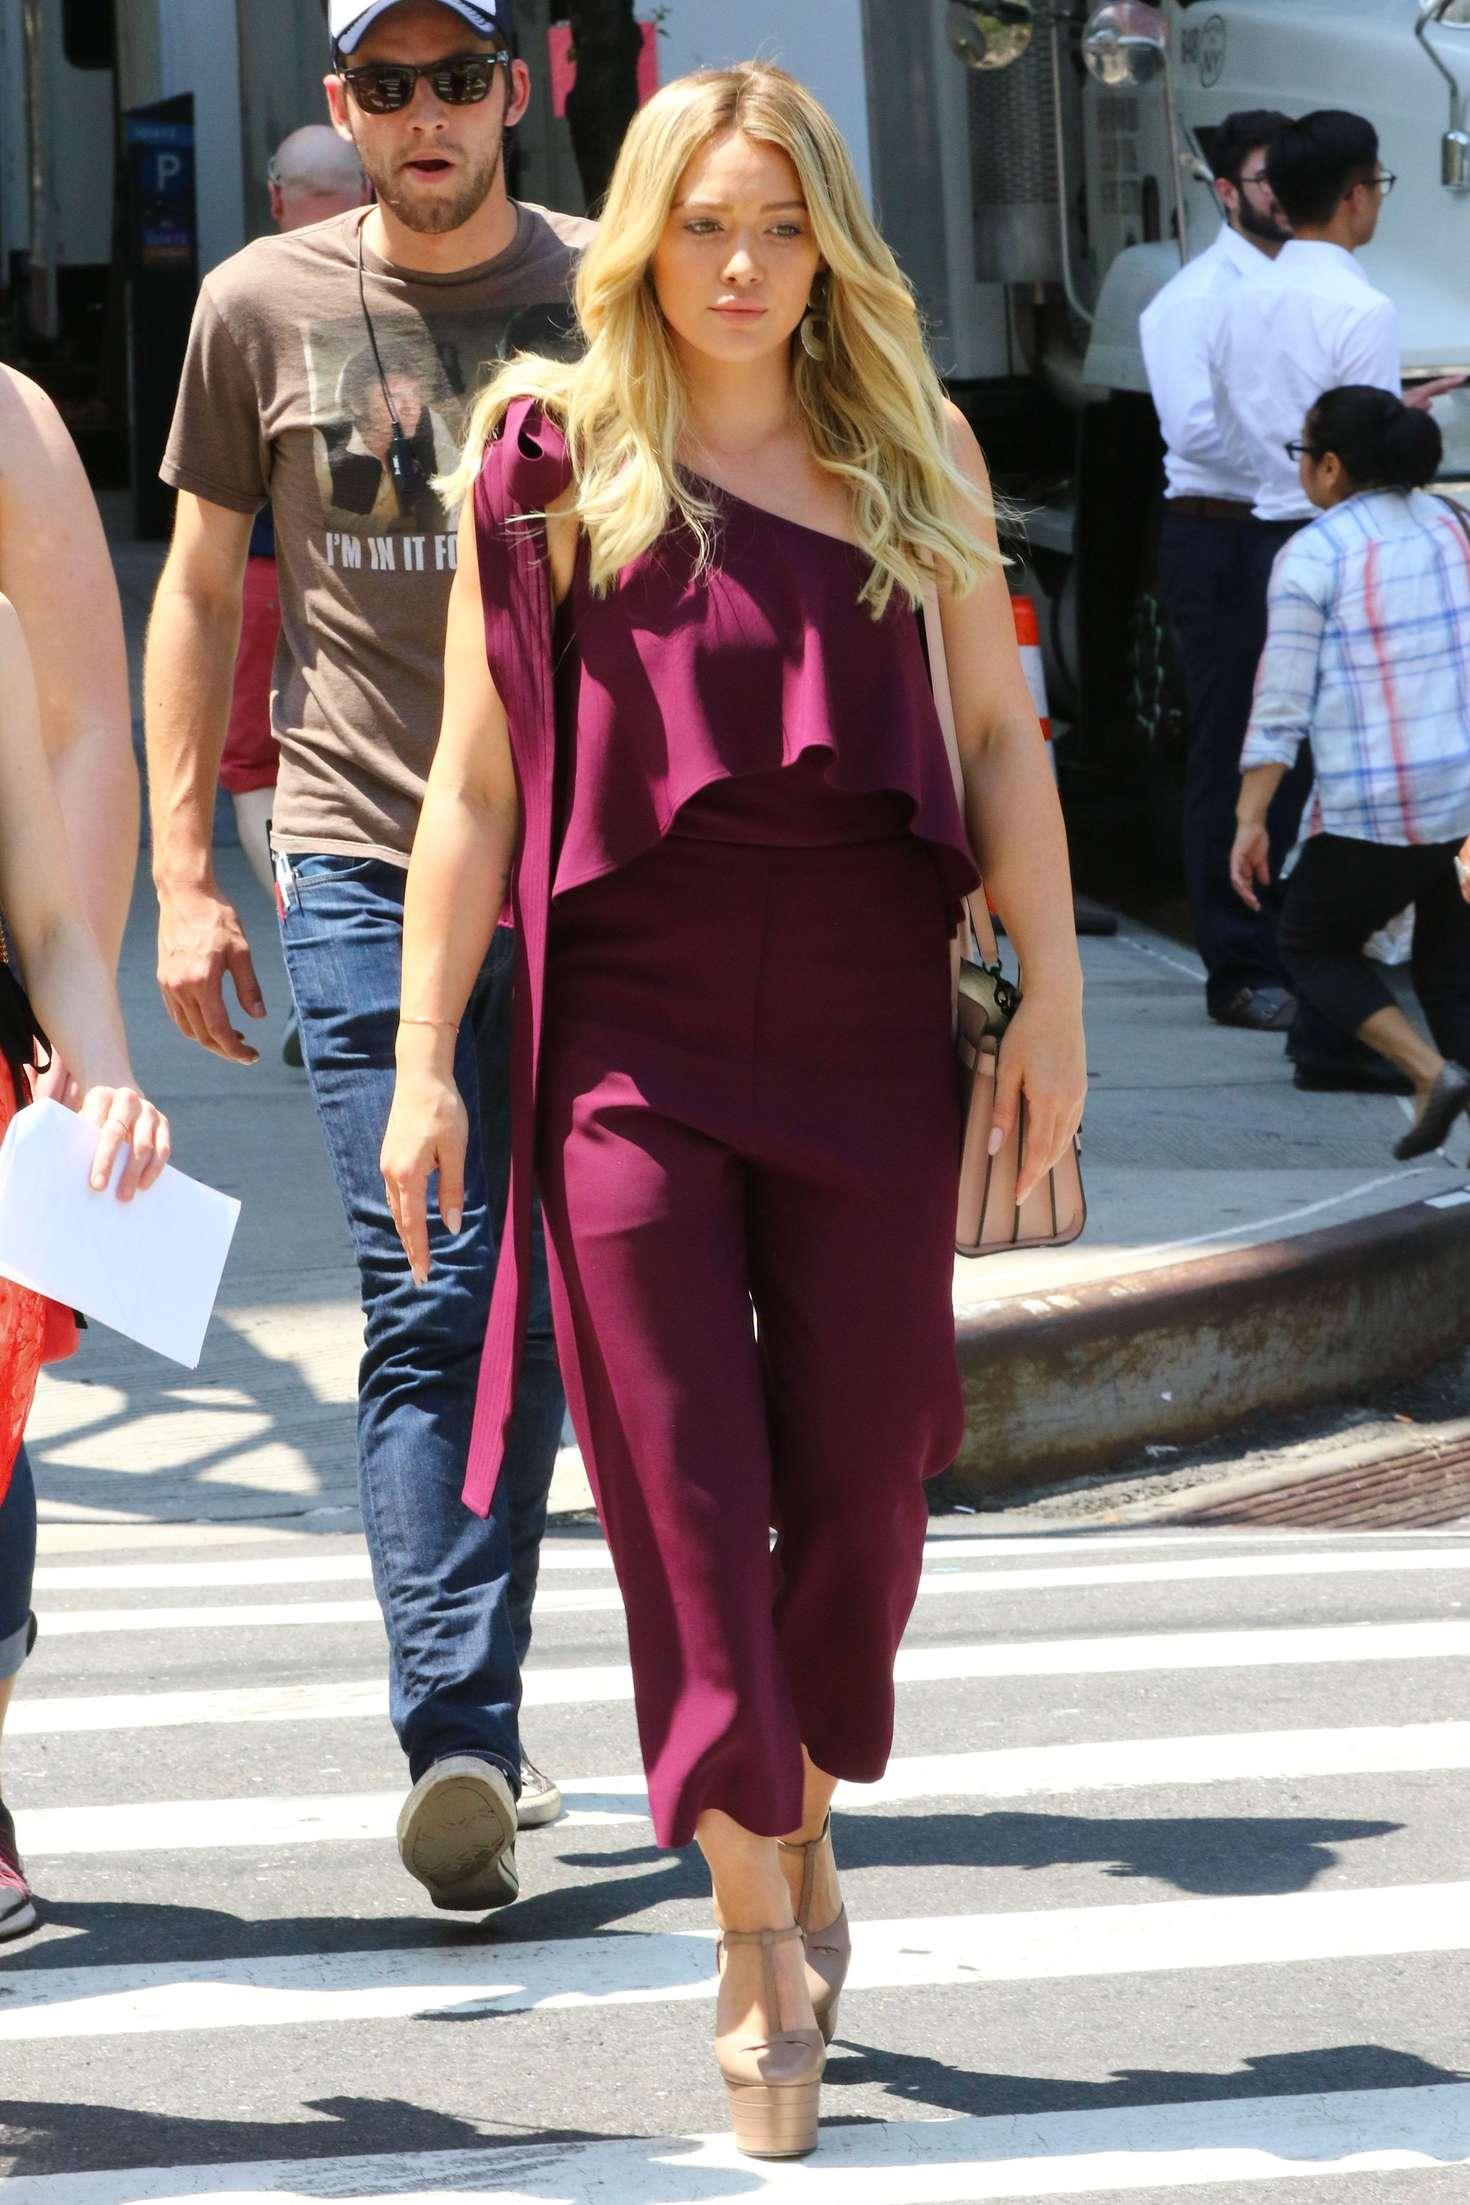 Hilary Duff 2017 : Hilary Duff on Younger Set -02